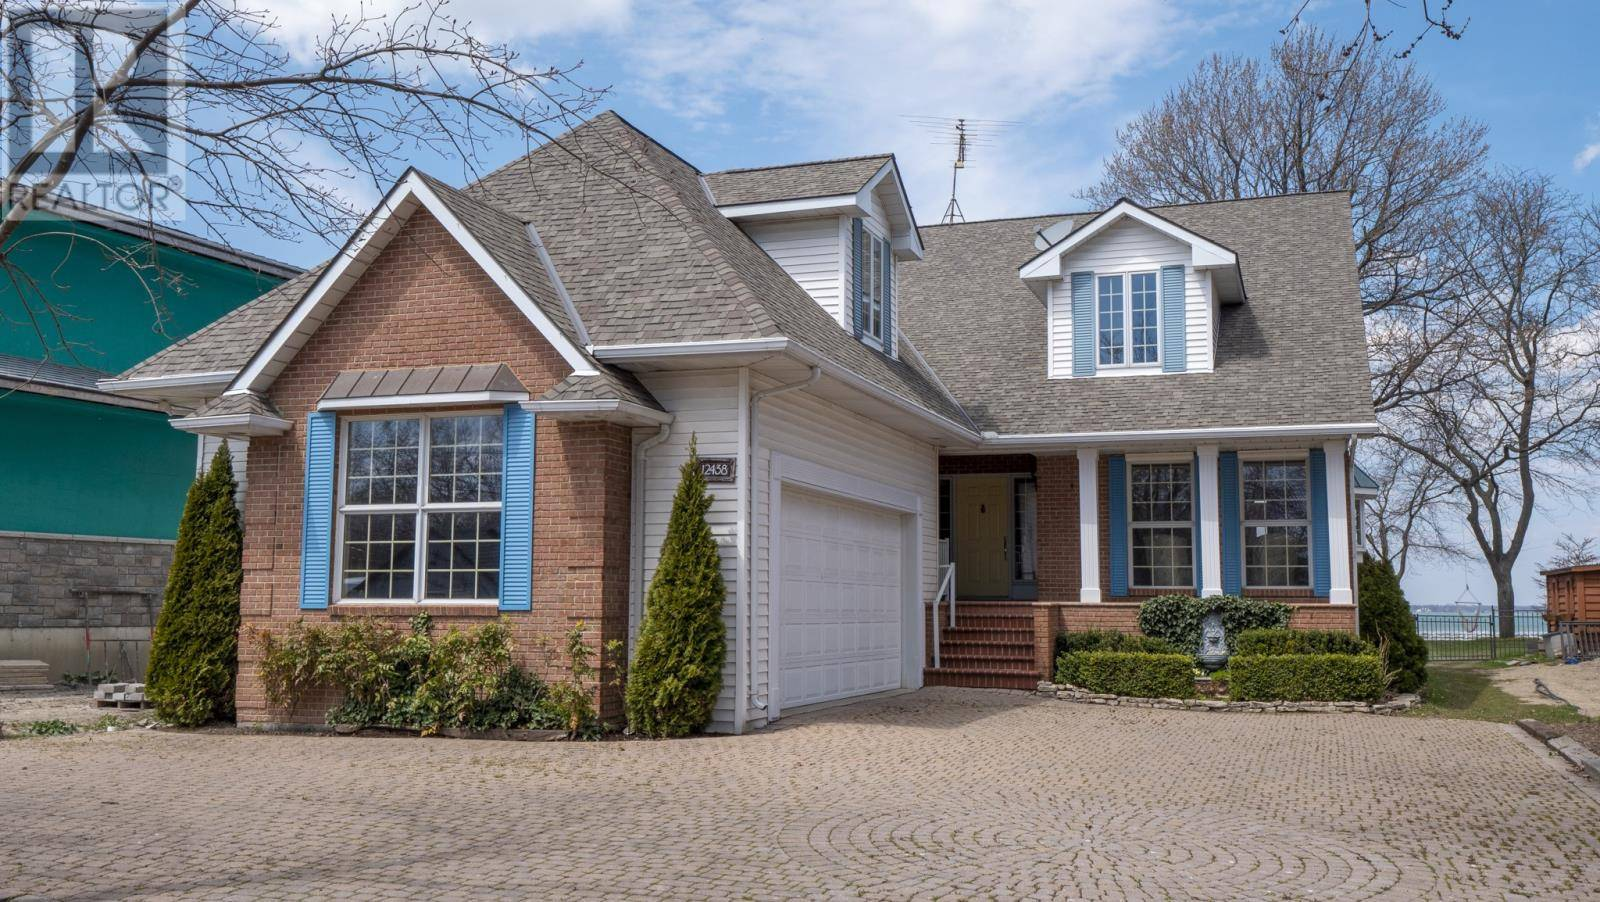 House for sale at 12438 Riverside Dr East Tecumseh Ontario - MLS: 20004763